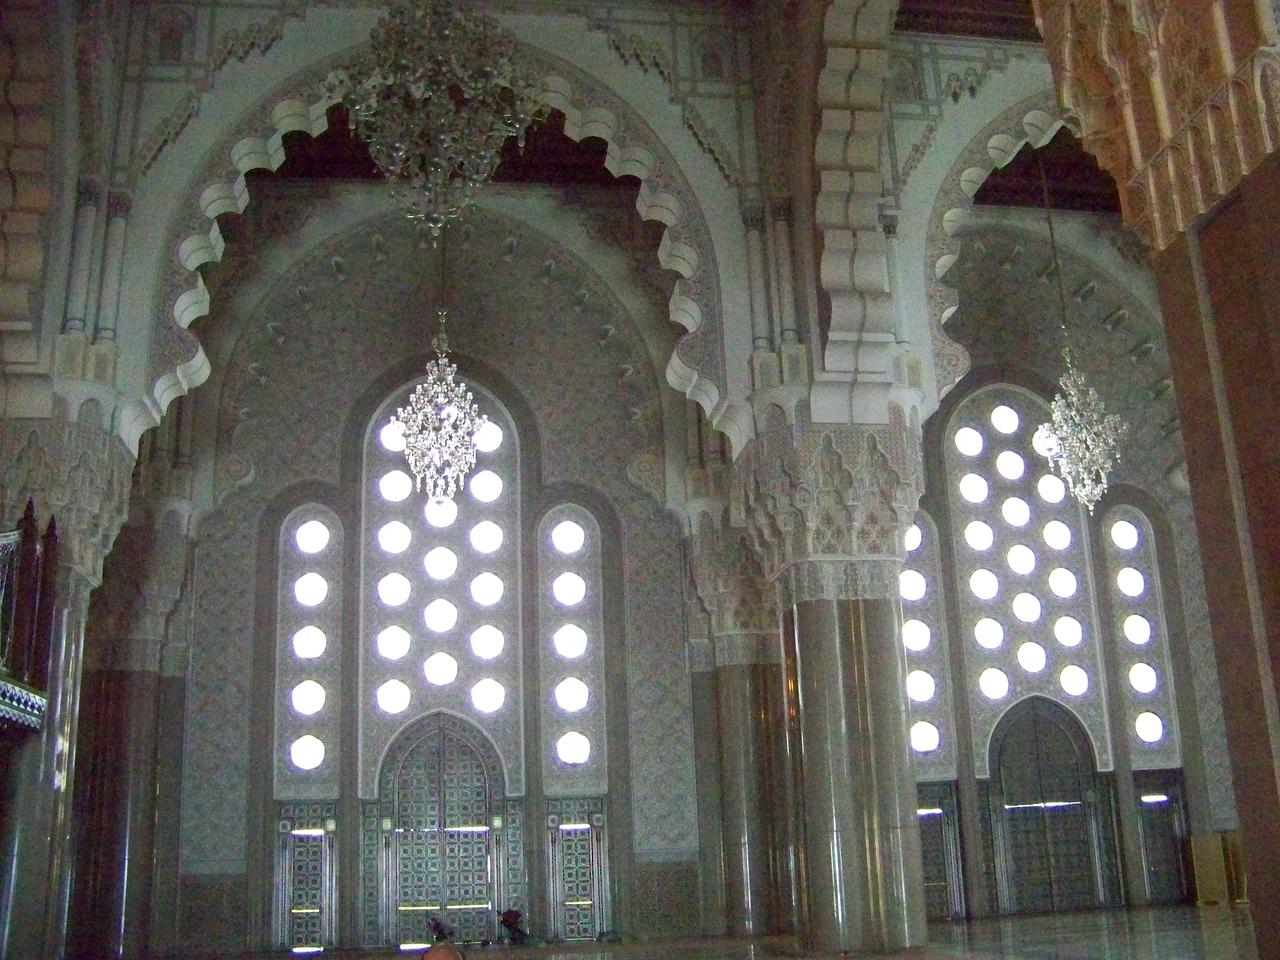 0014 - Hassan II Mosque - Casablanca Morocco.JPG